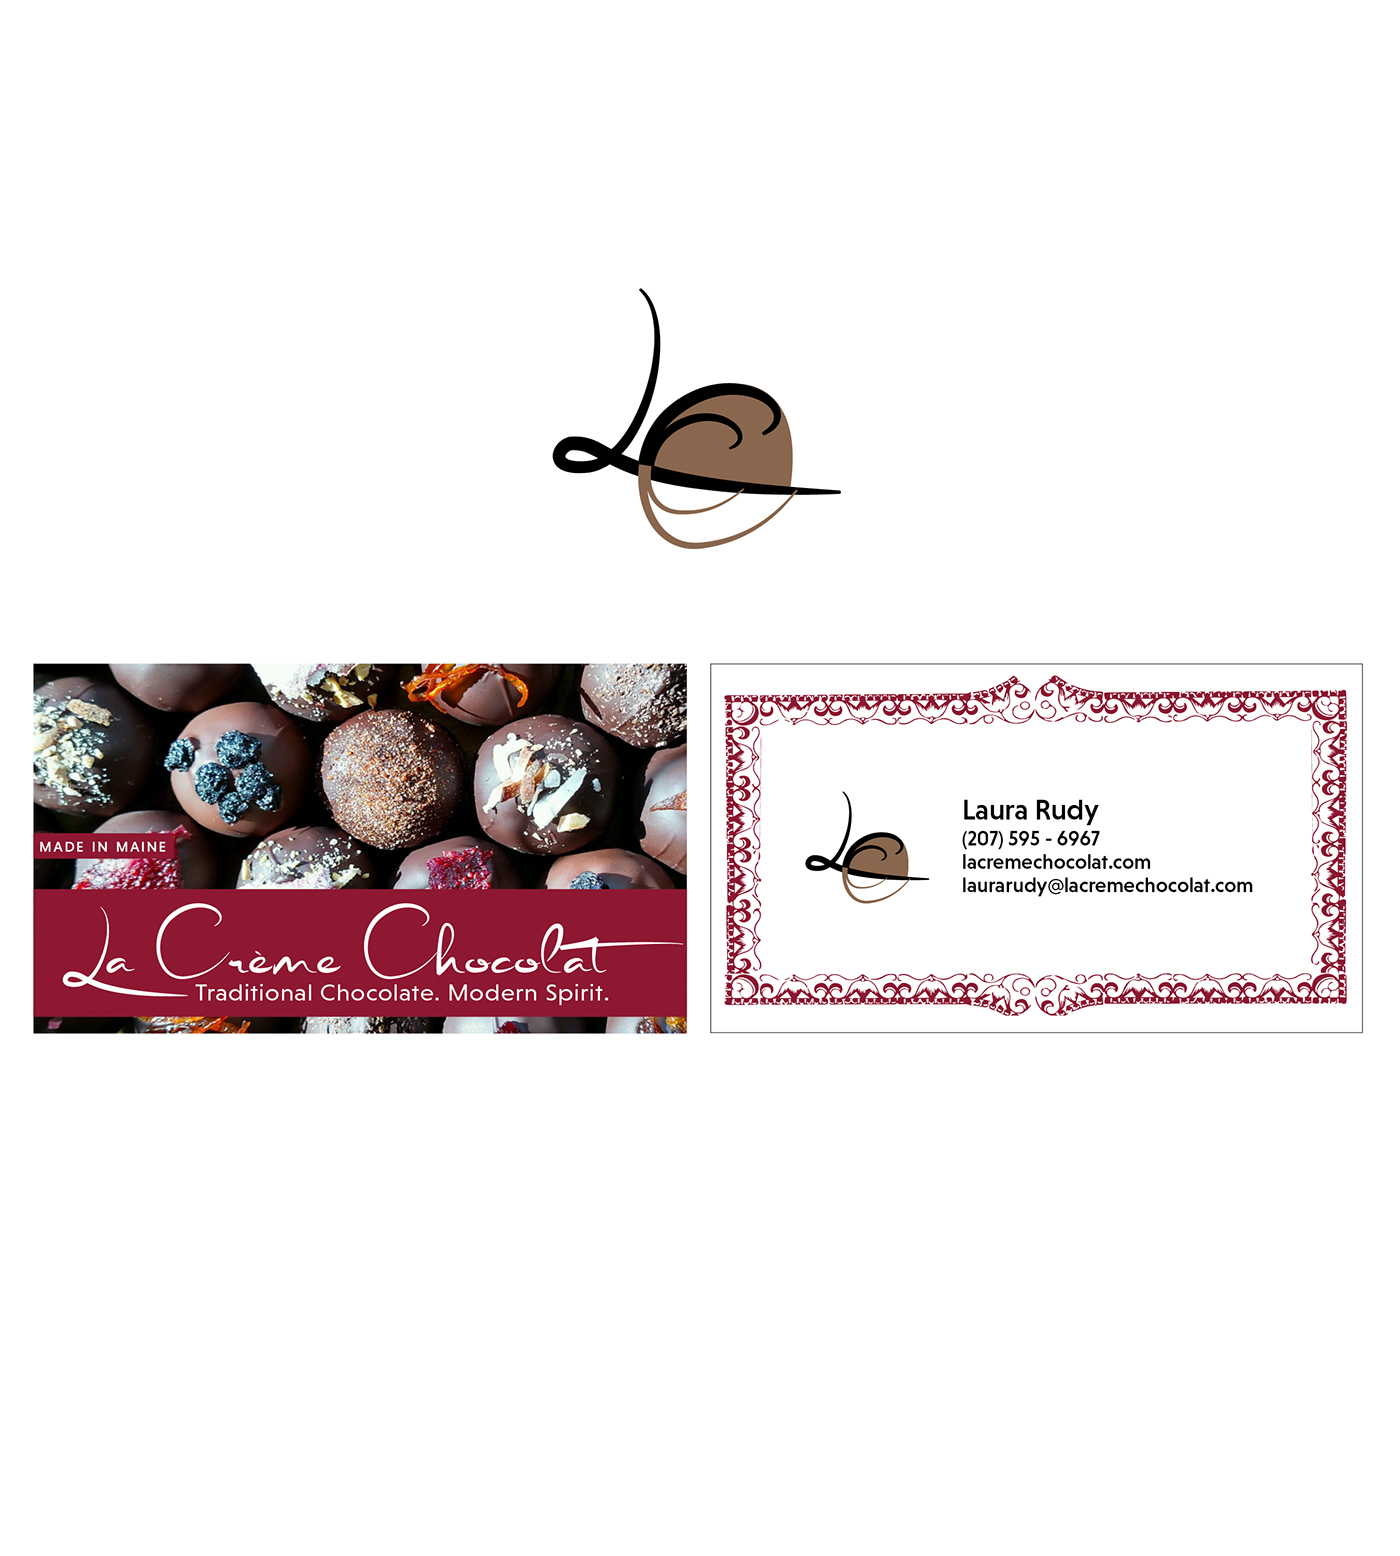 La Creme Chocolate Business Card + Icon on Behance